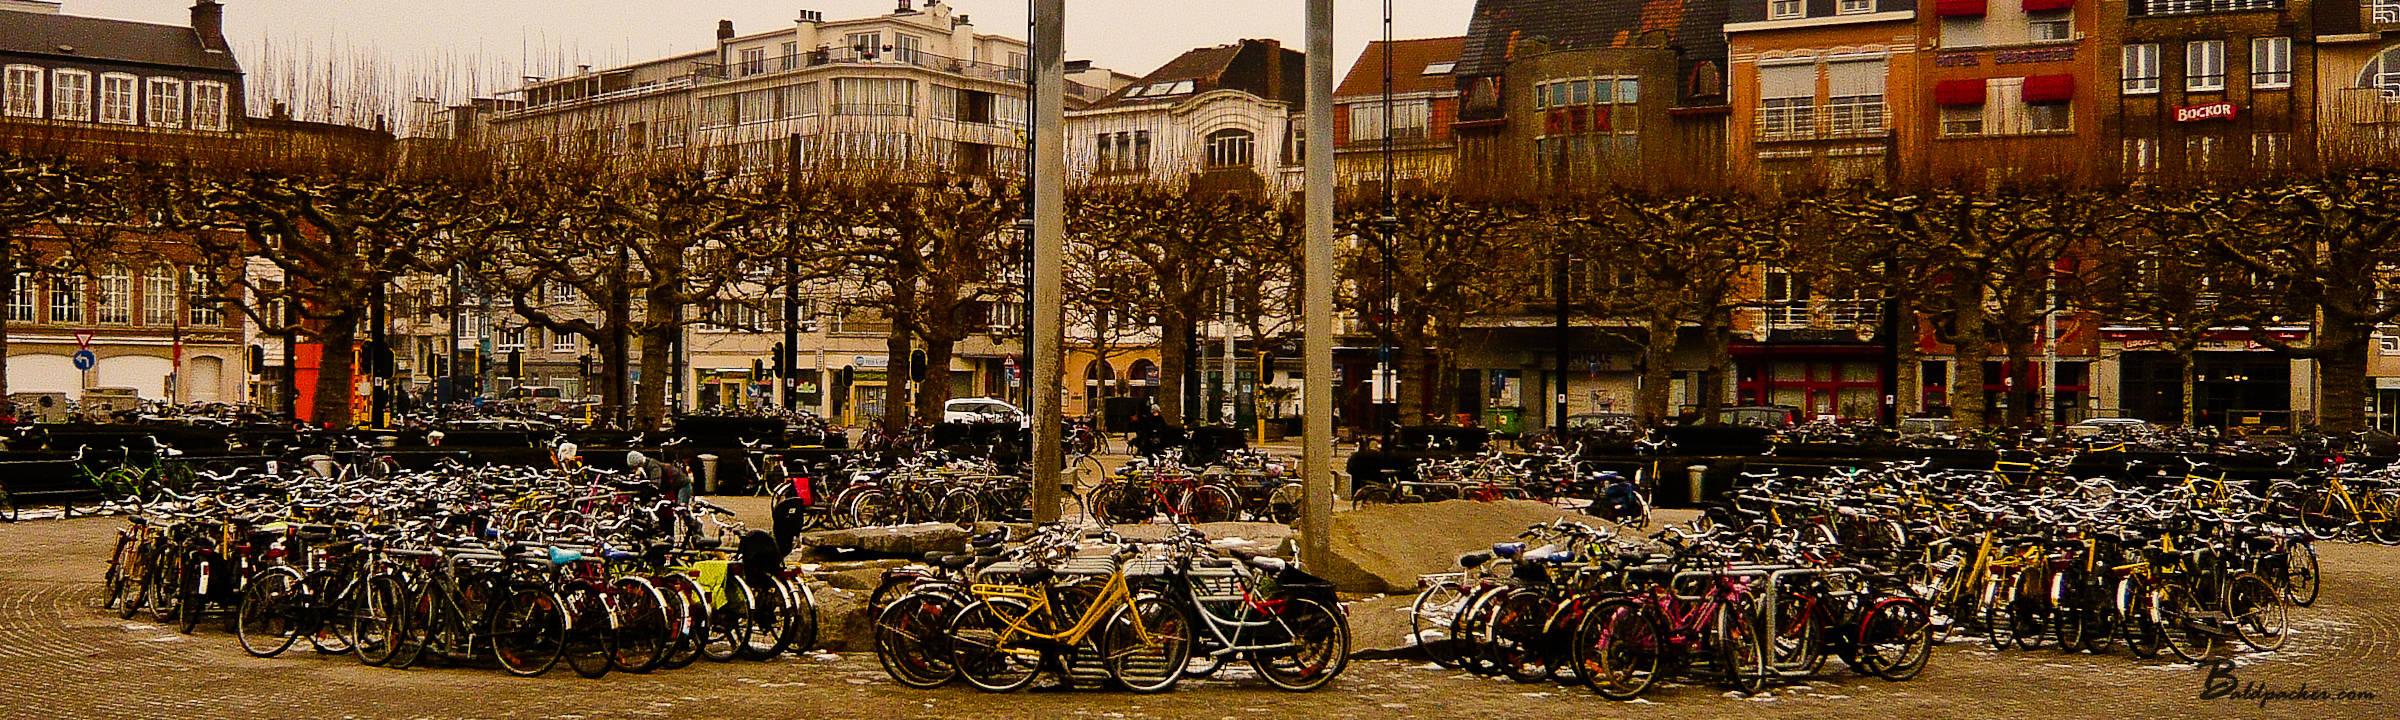 A Weekend in Belgium: Ghent